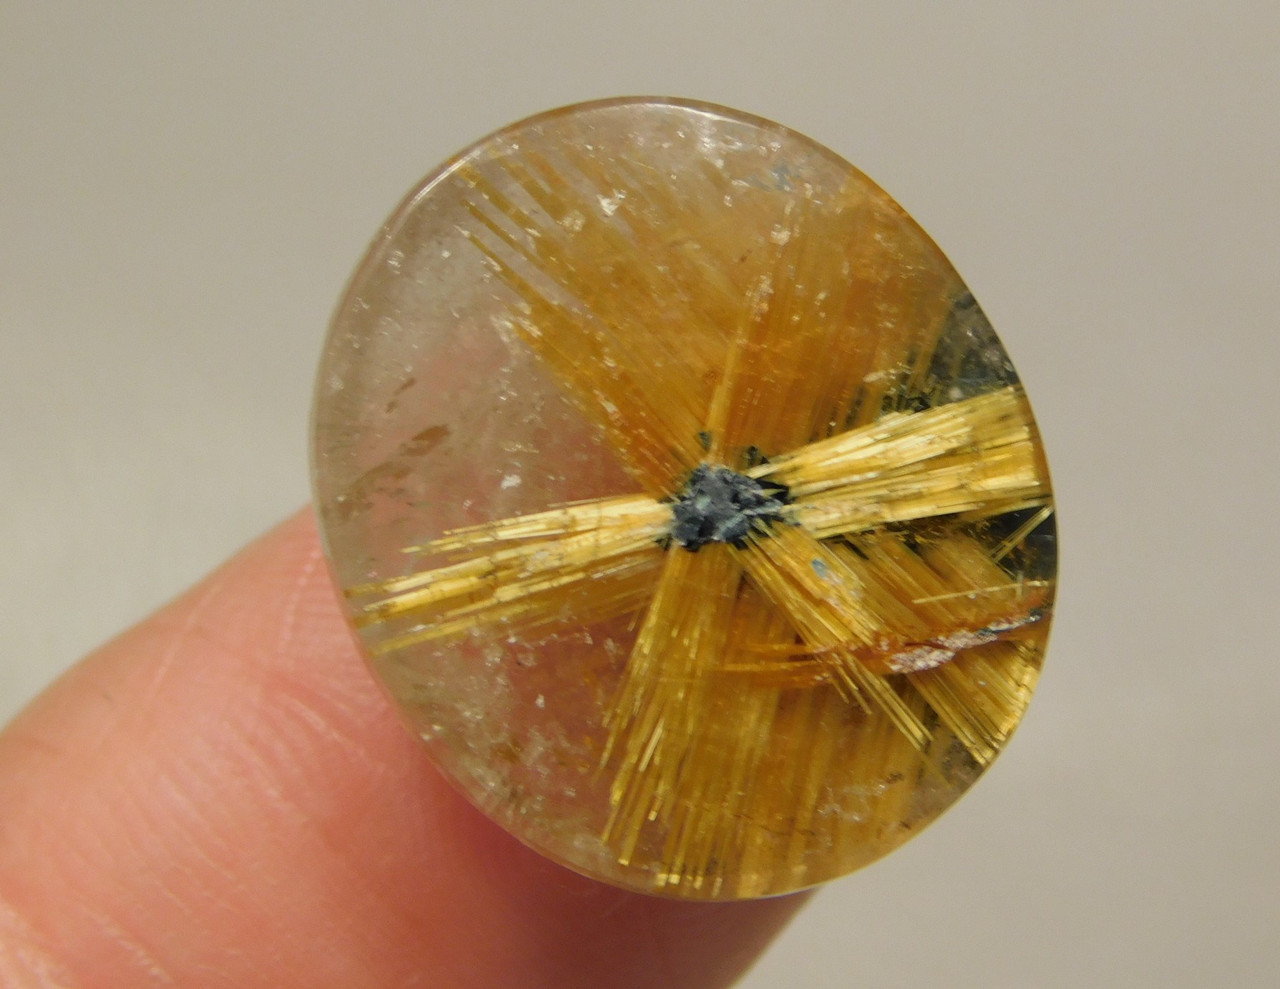 Star Rutile Quartz Rutilated Clear Gemstone Cabochon #SRQ12